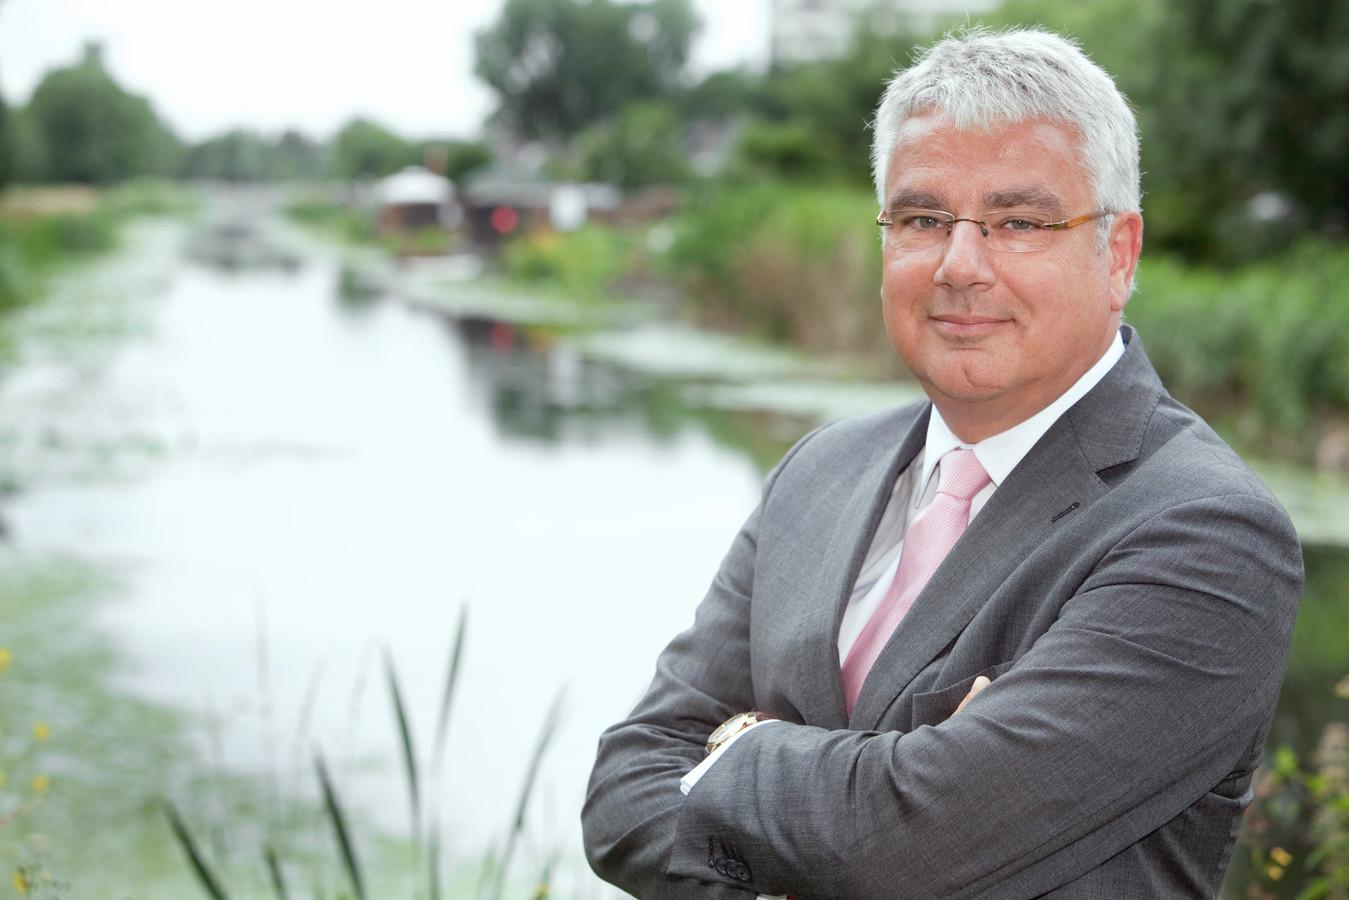 Foto: Joep van der Pal  Frank Koen is per 11 januari waarnemend burgemeester van Wassenaar.